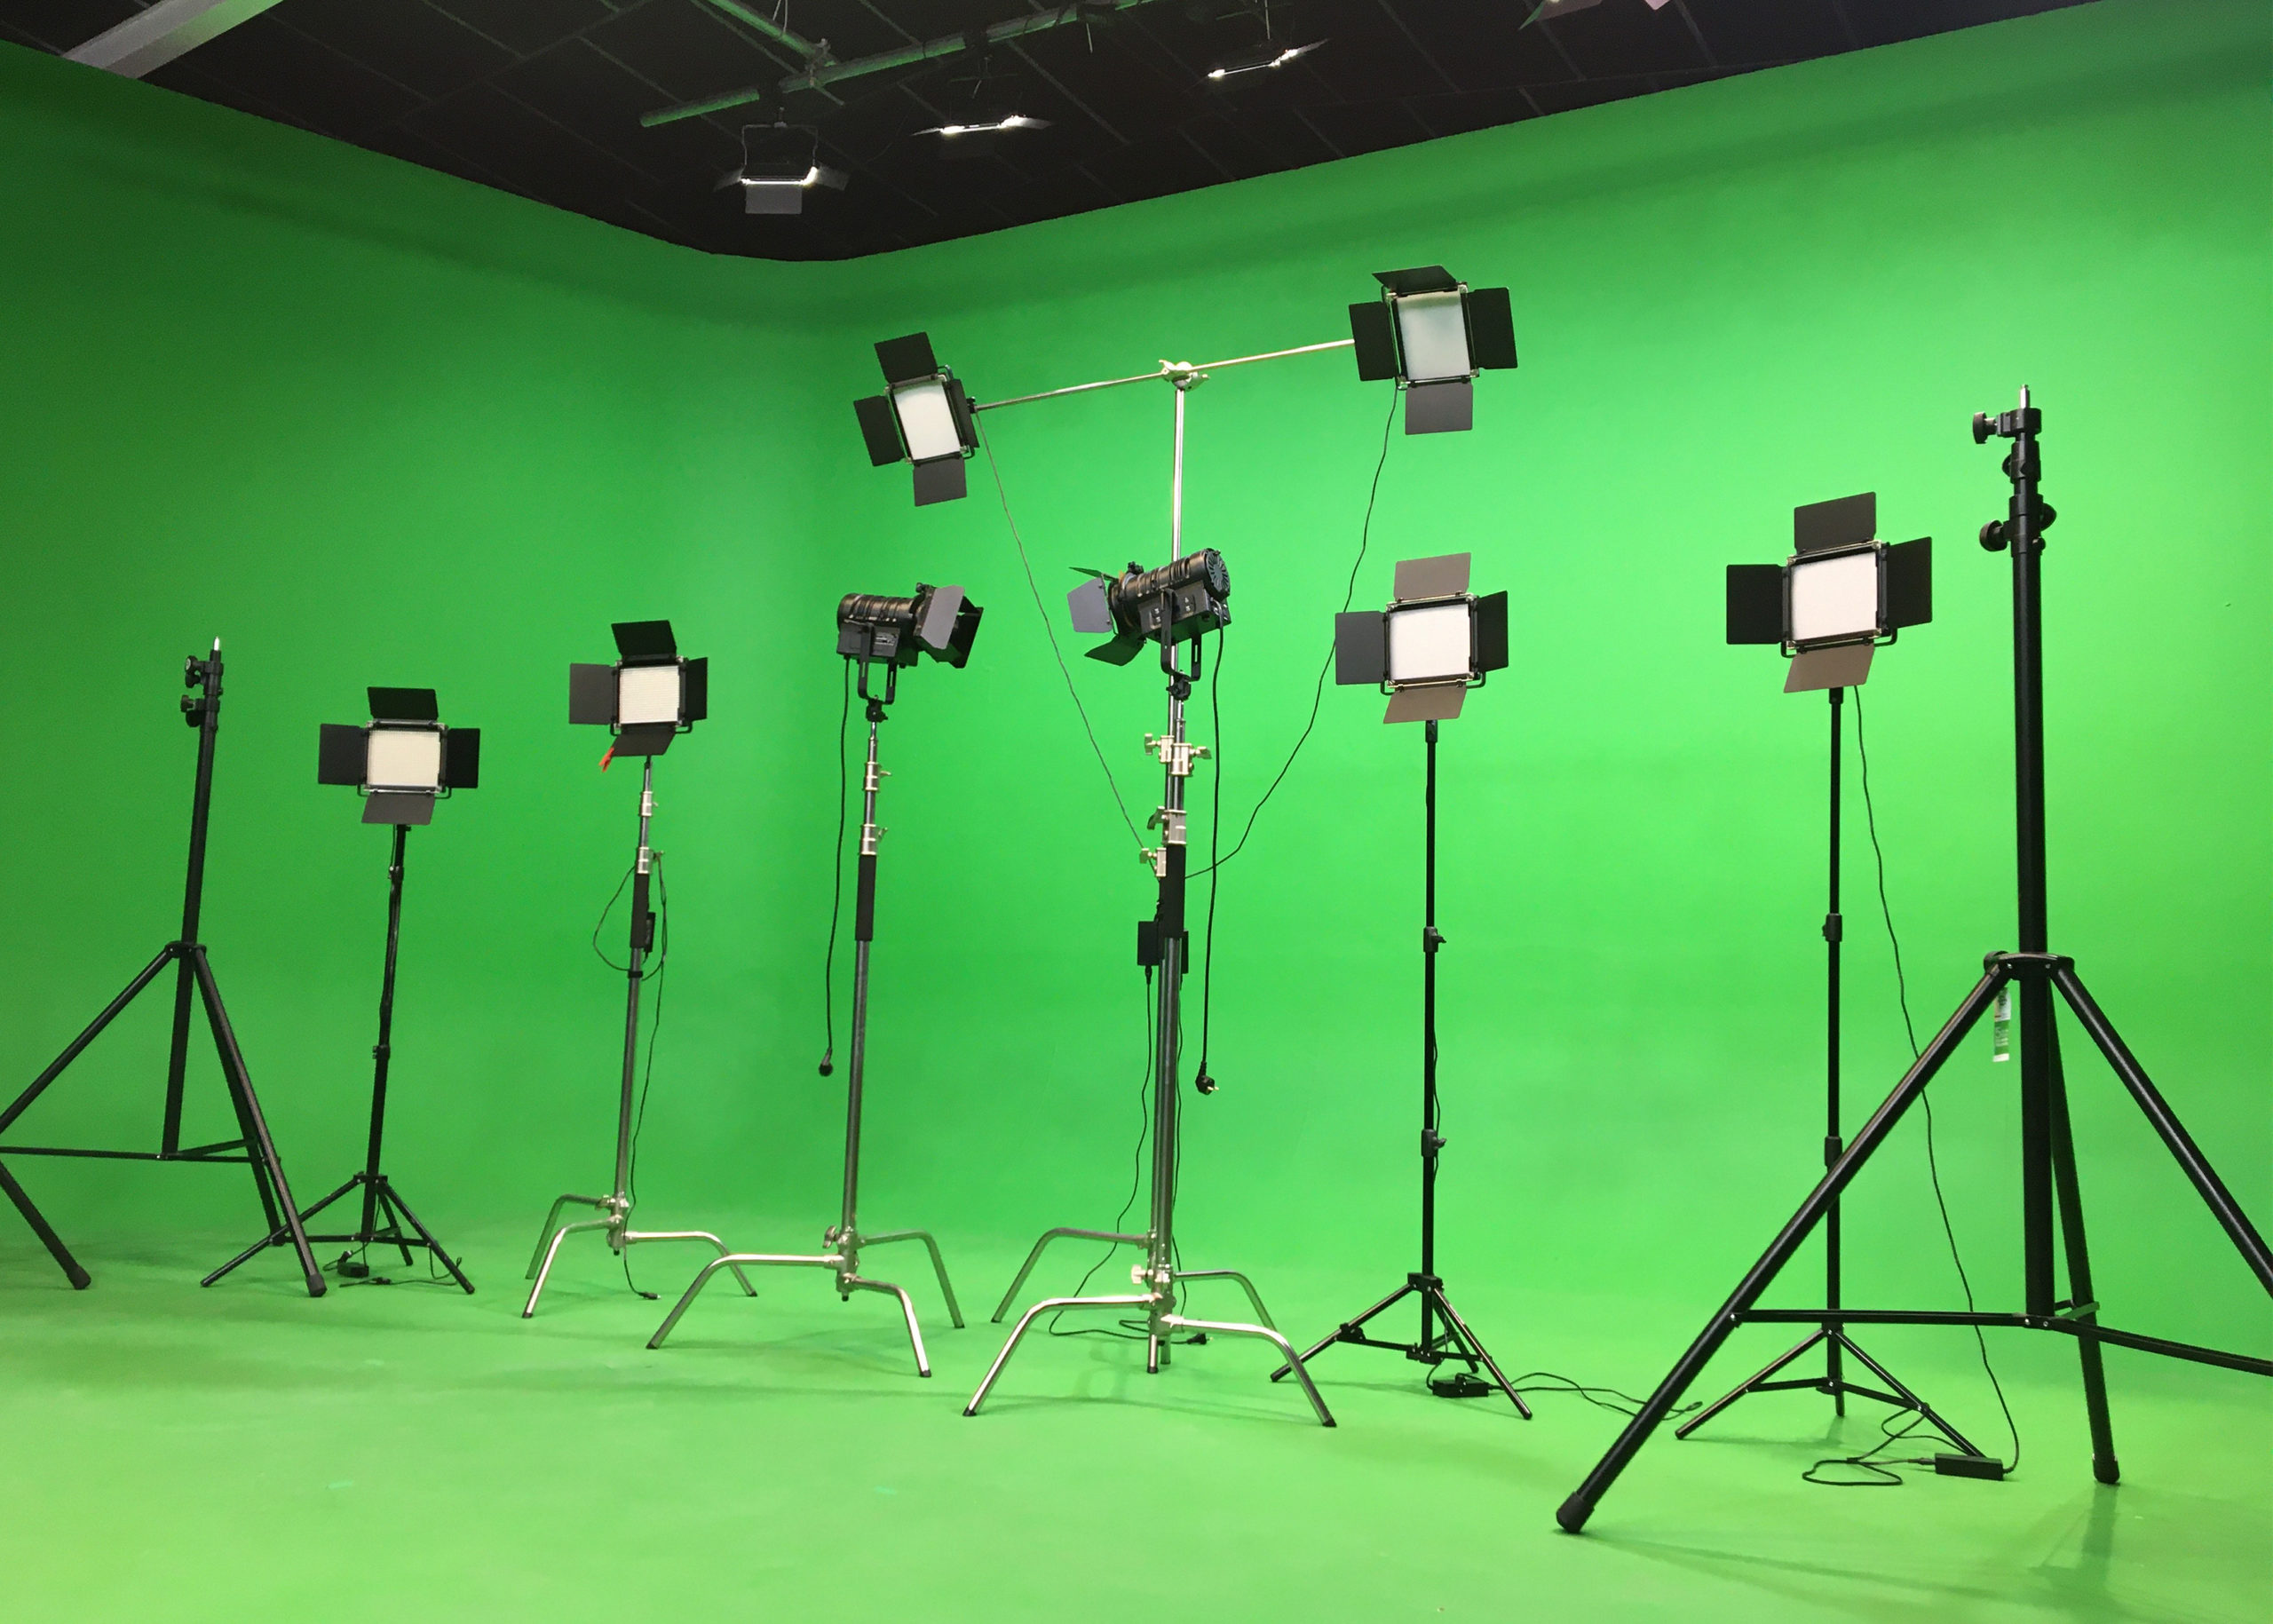 ukpikproductions-productora-audiovisual-valencia